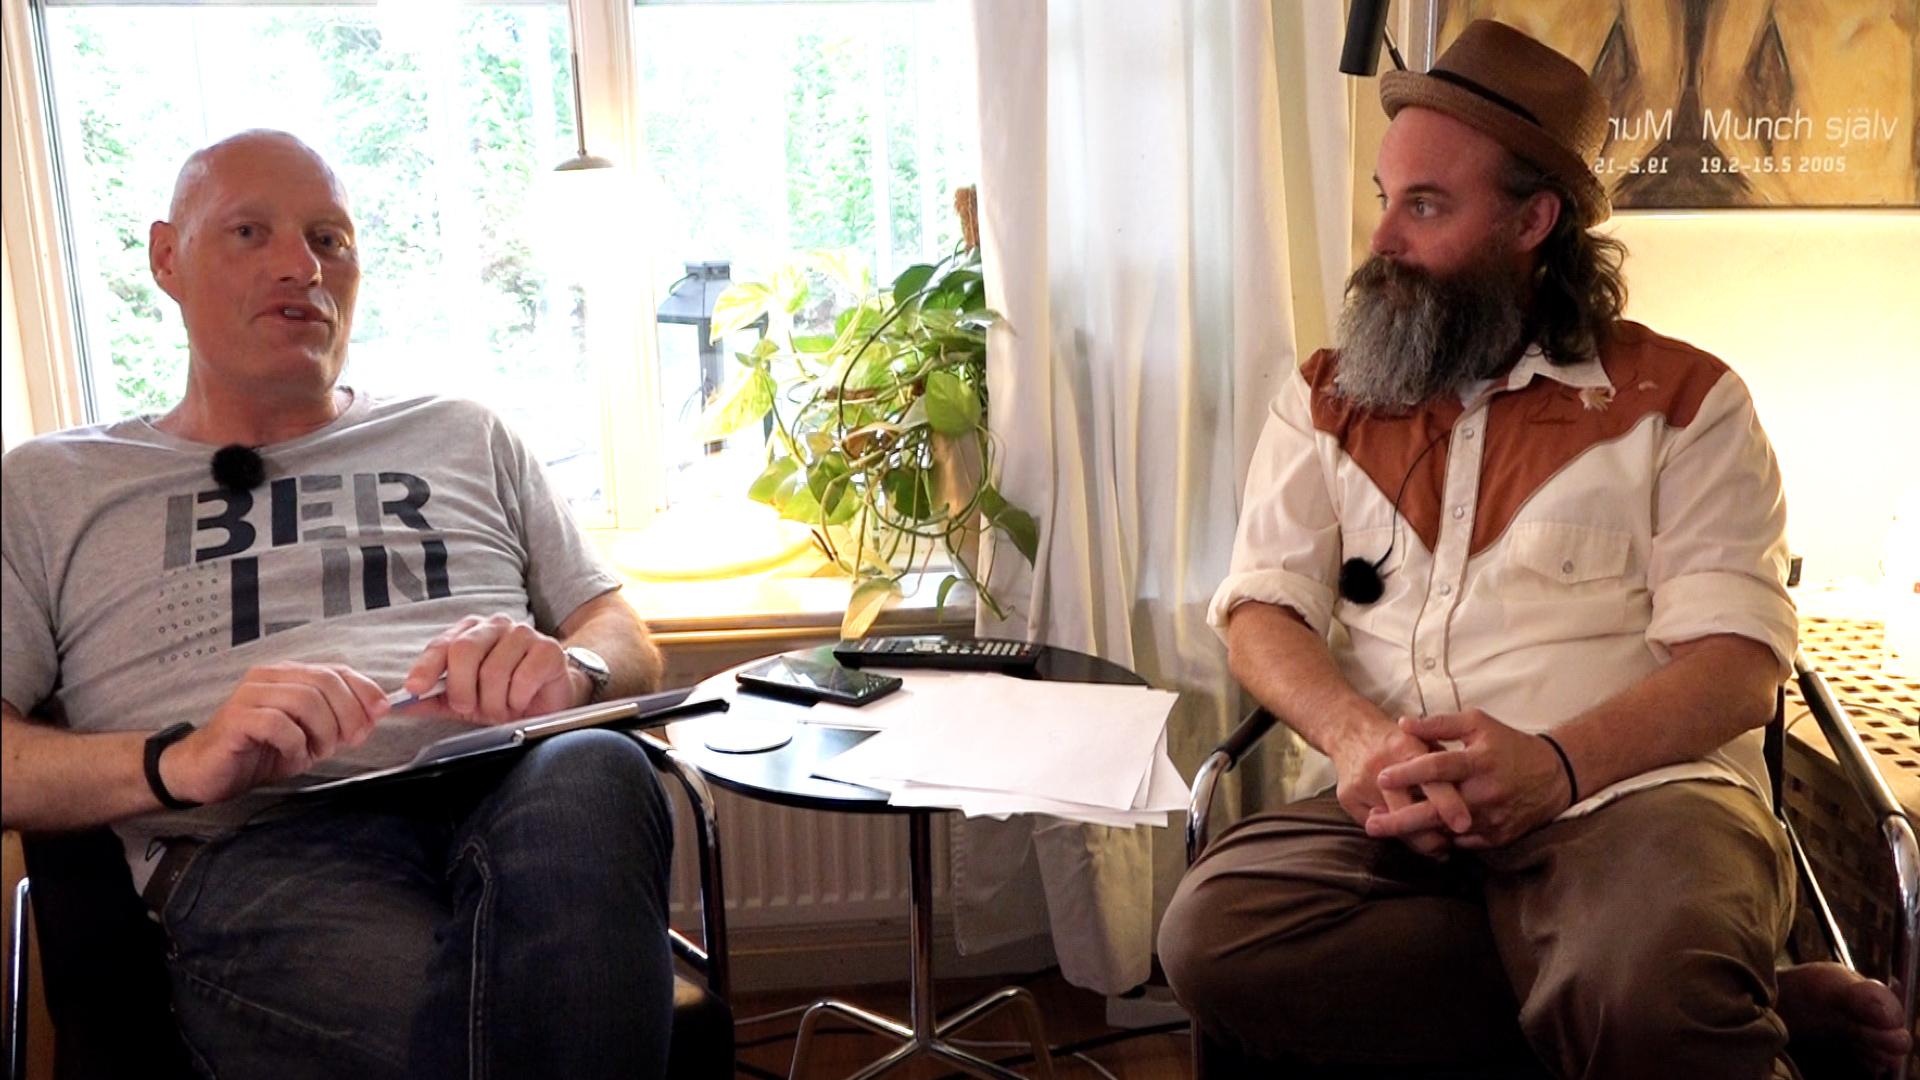 Fotokonfrontation Mordet på Olof Palme